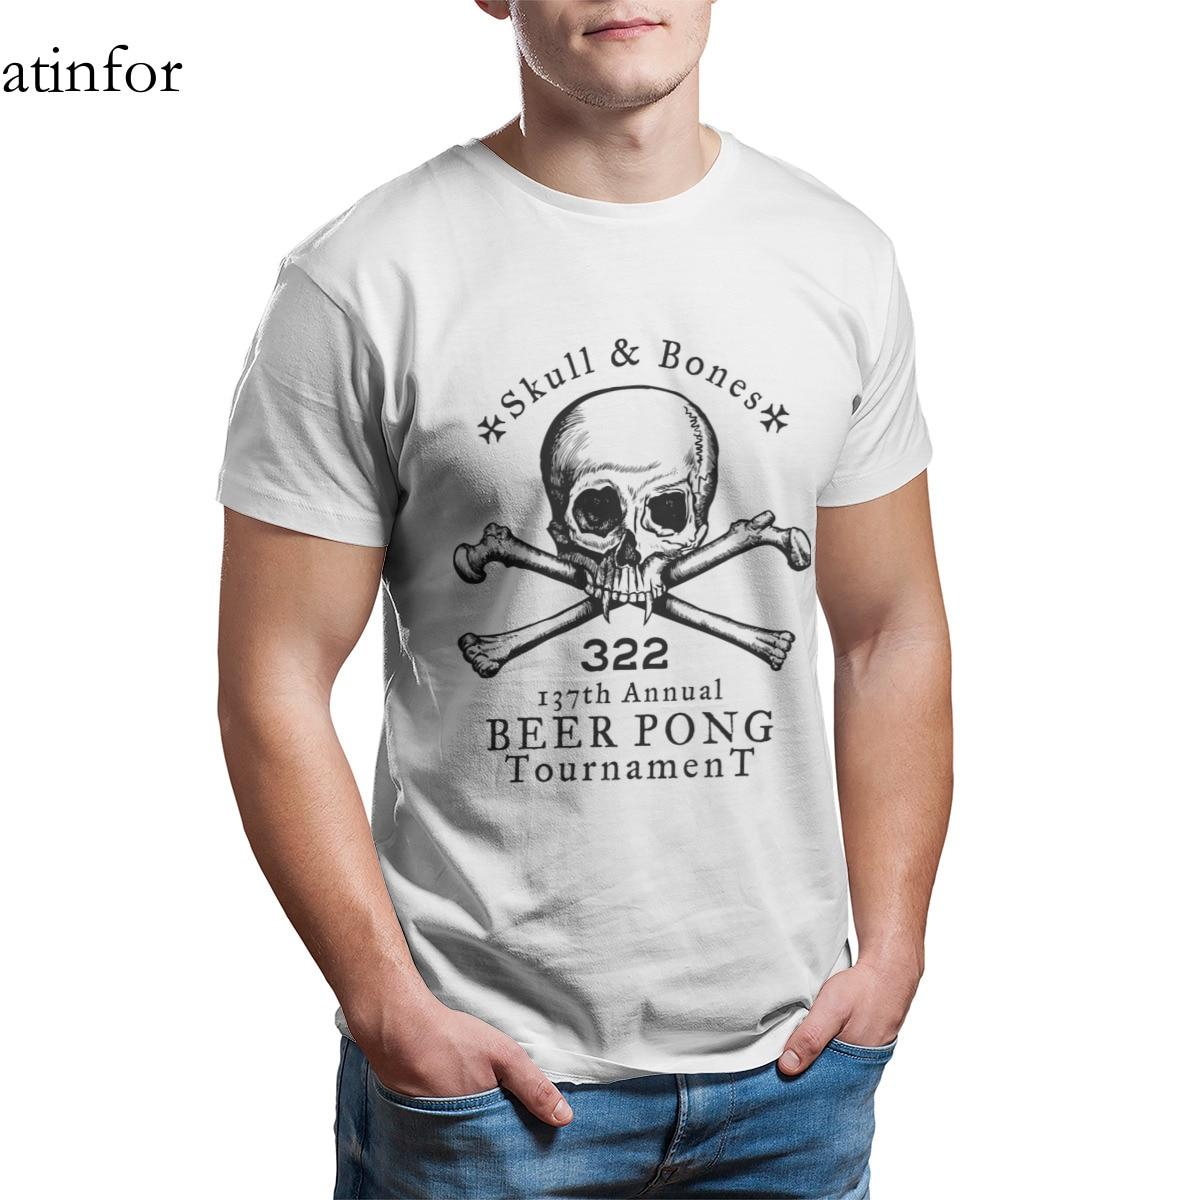 Skull Bones Beer Pong Tournament T-Shirt Print Custom Short Sleeve Graphic Cool T-shirt 25491